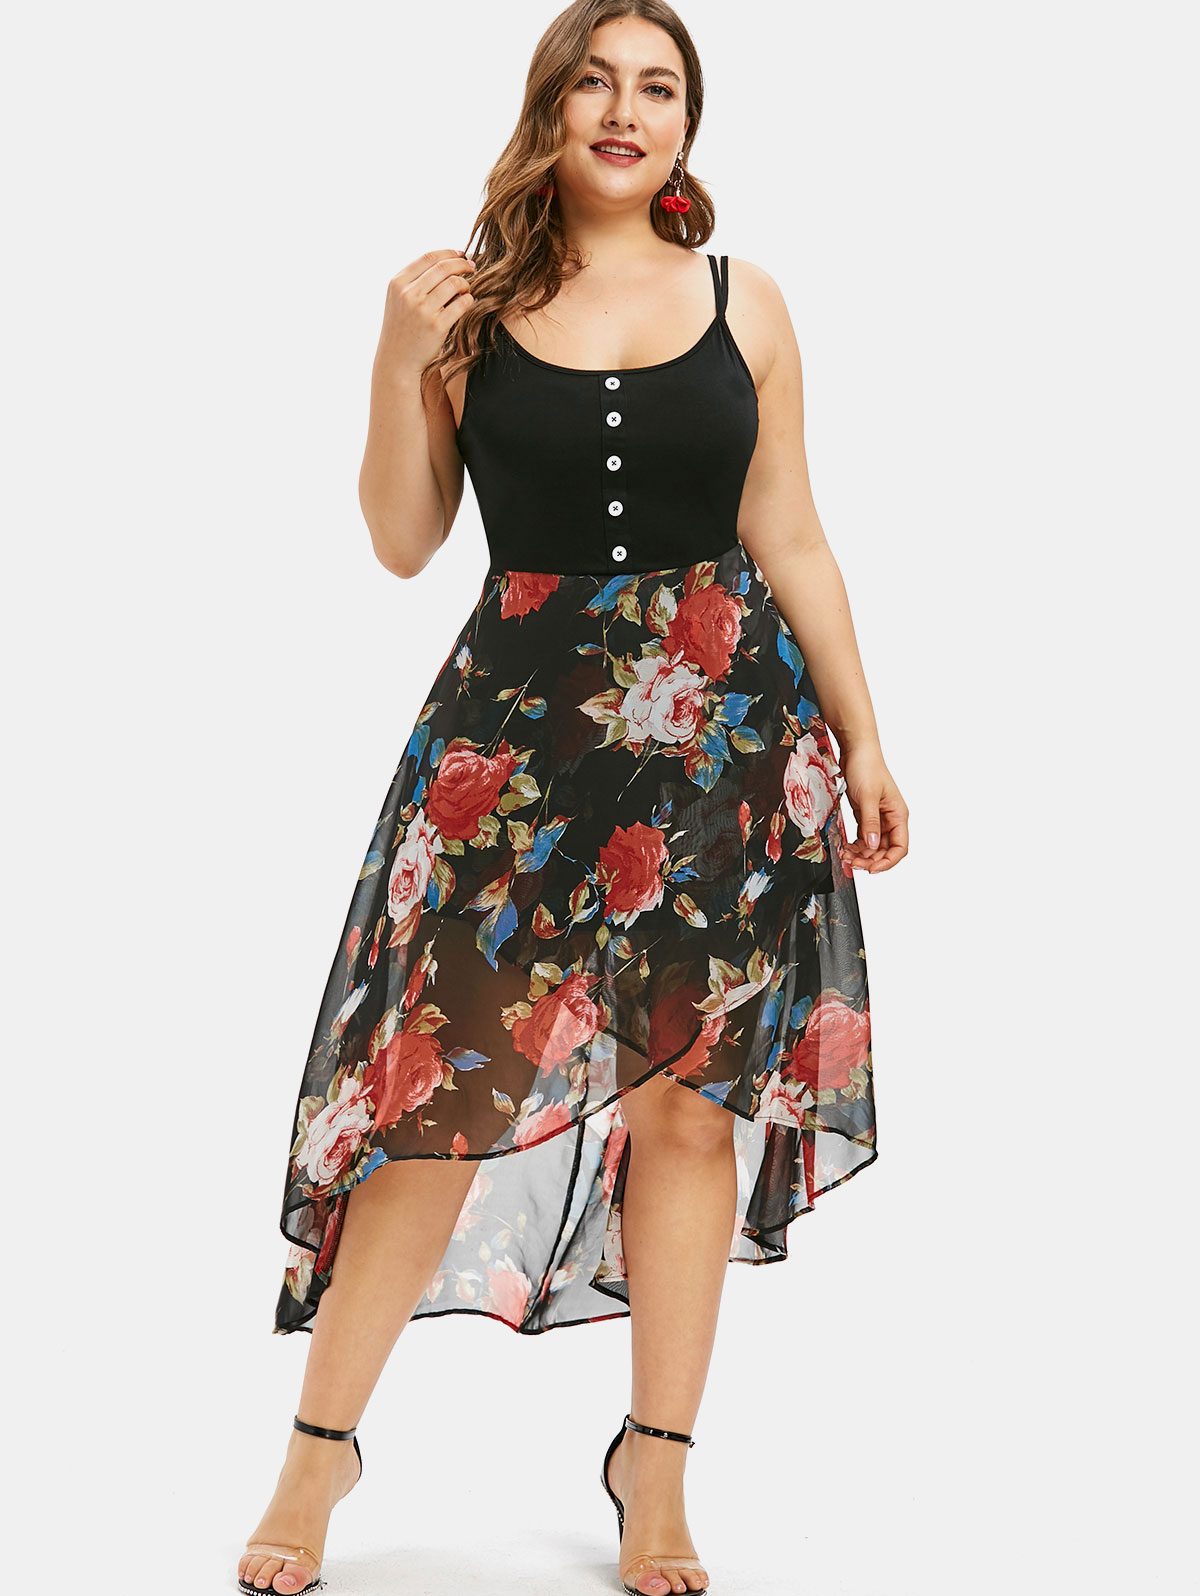 Wipalo Plus Size Floral Overlay High Low Dress Asymmetrical Spaghetti Strap Maxi Dress Bodycon Summer Robe